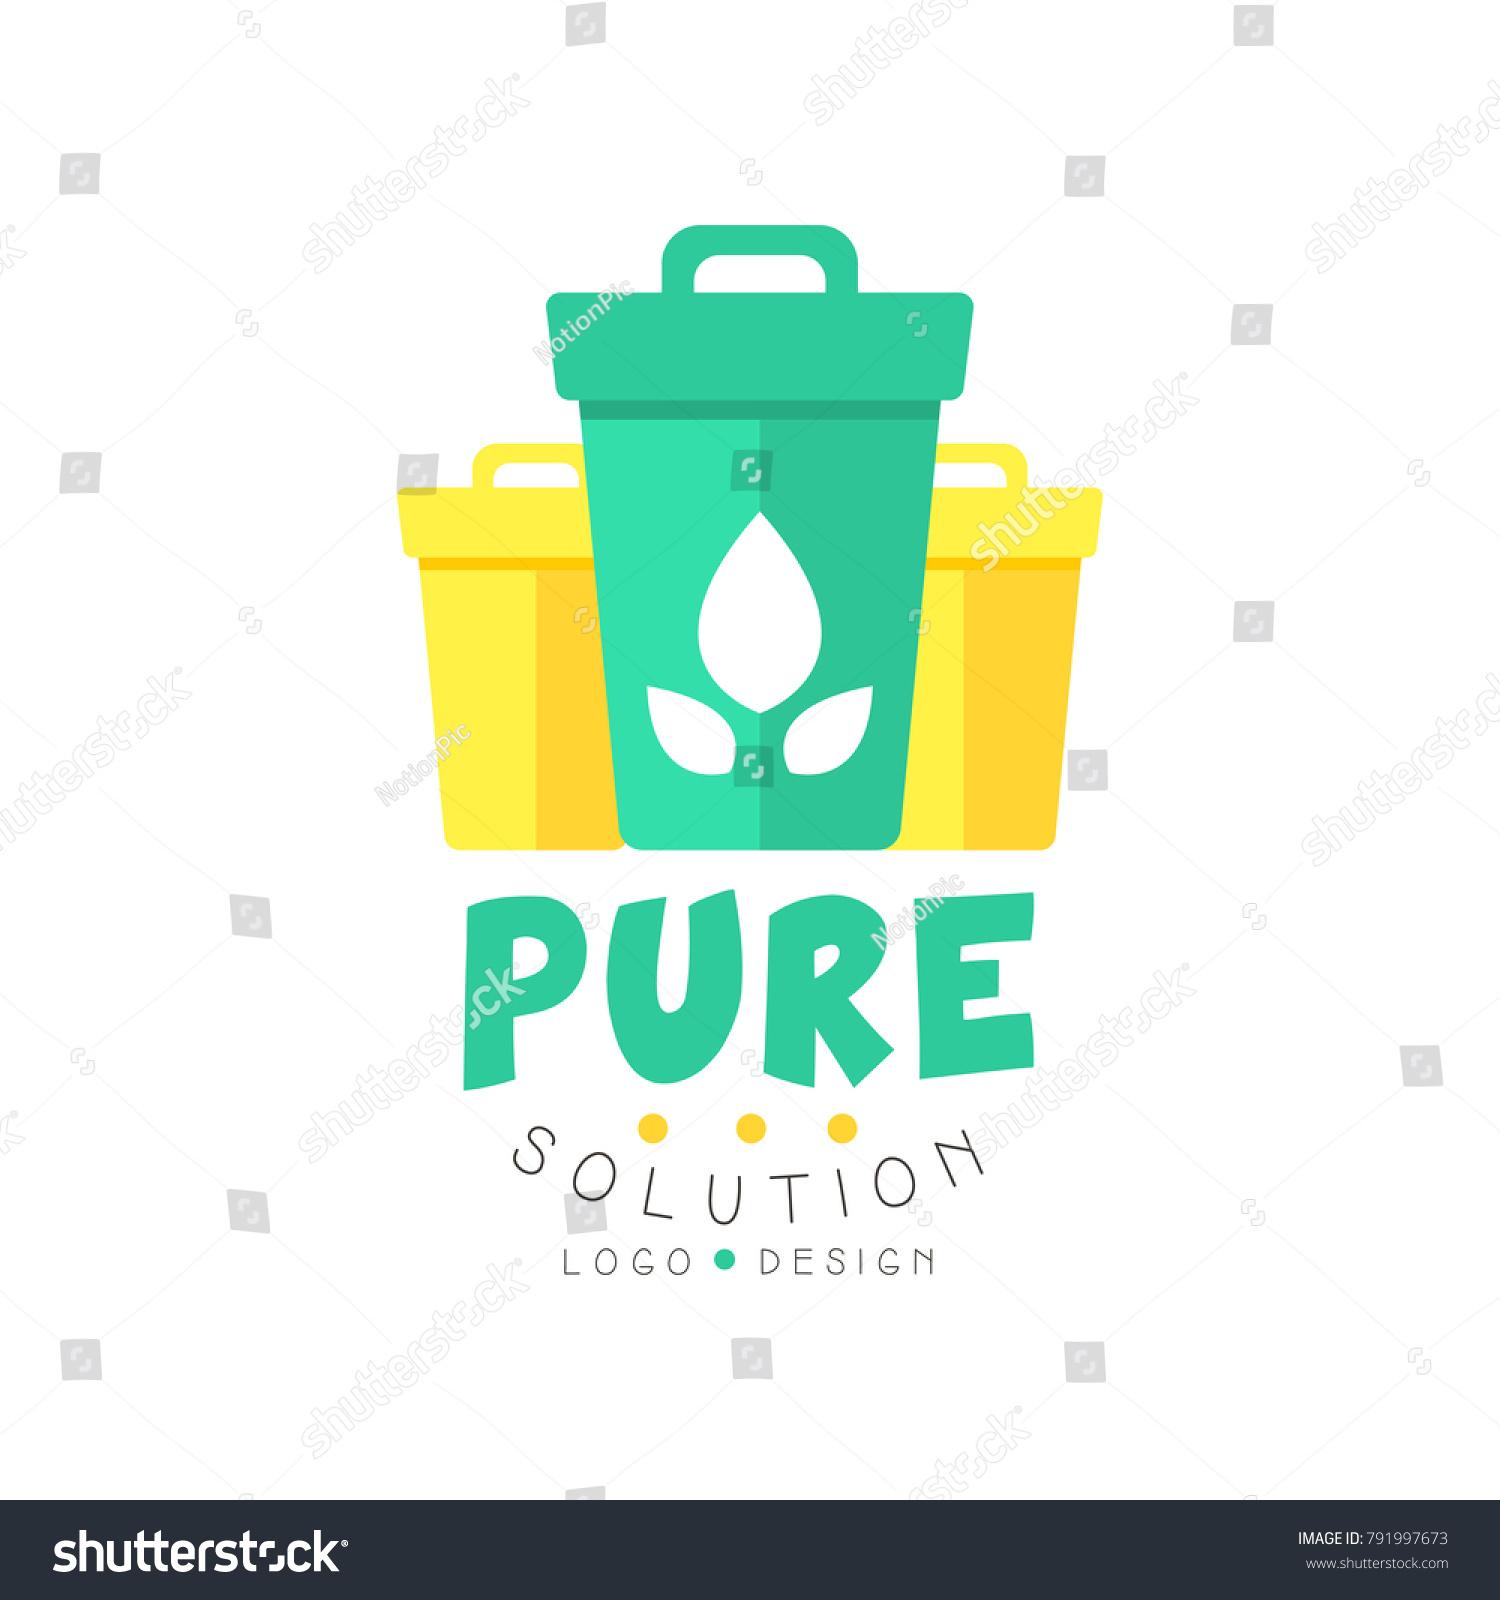 Original Pure Solution Logo Design Template Stock Vector (Royalty ...